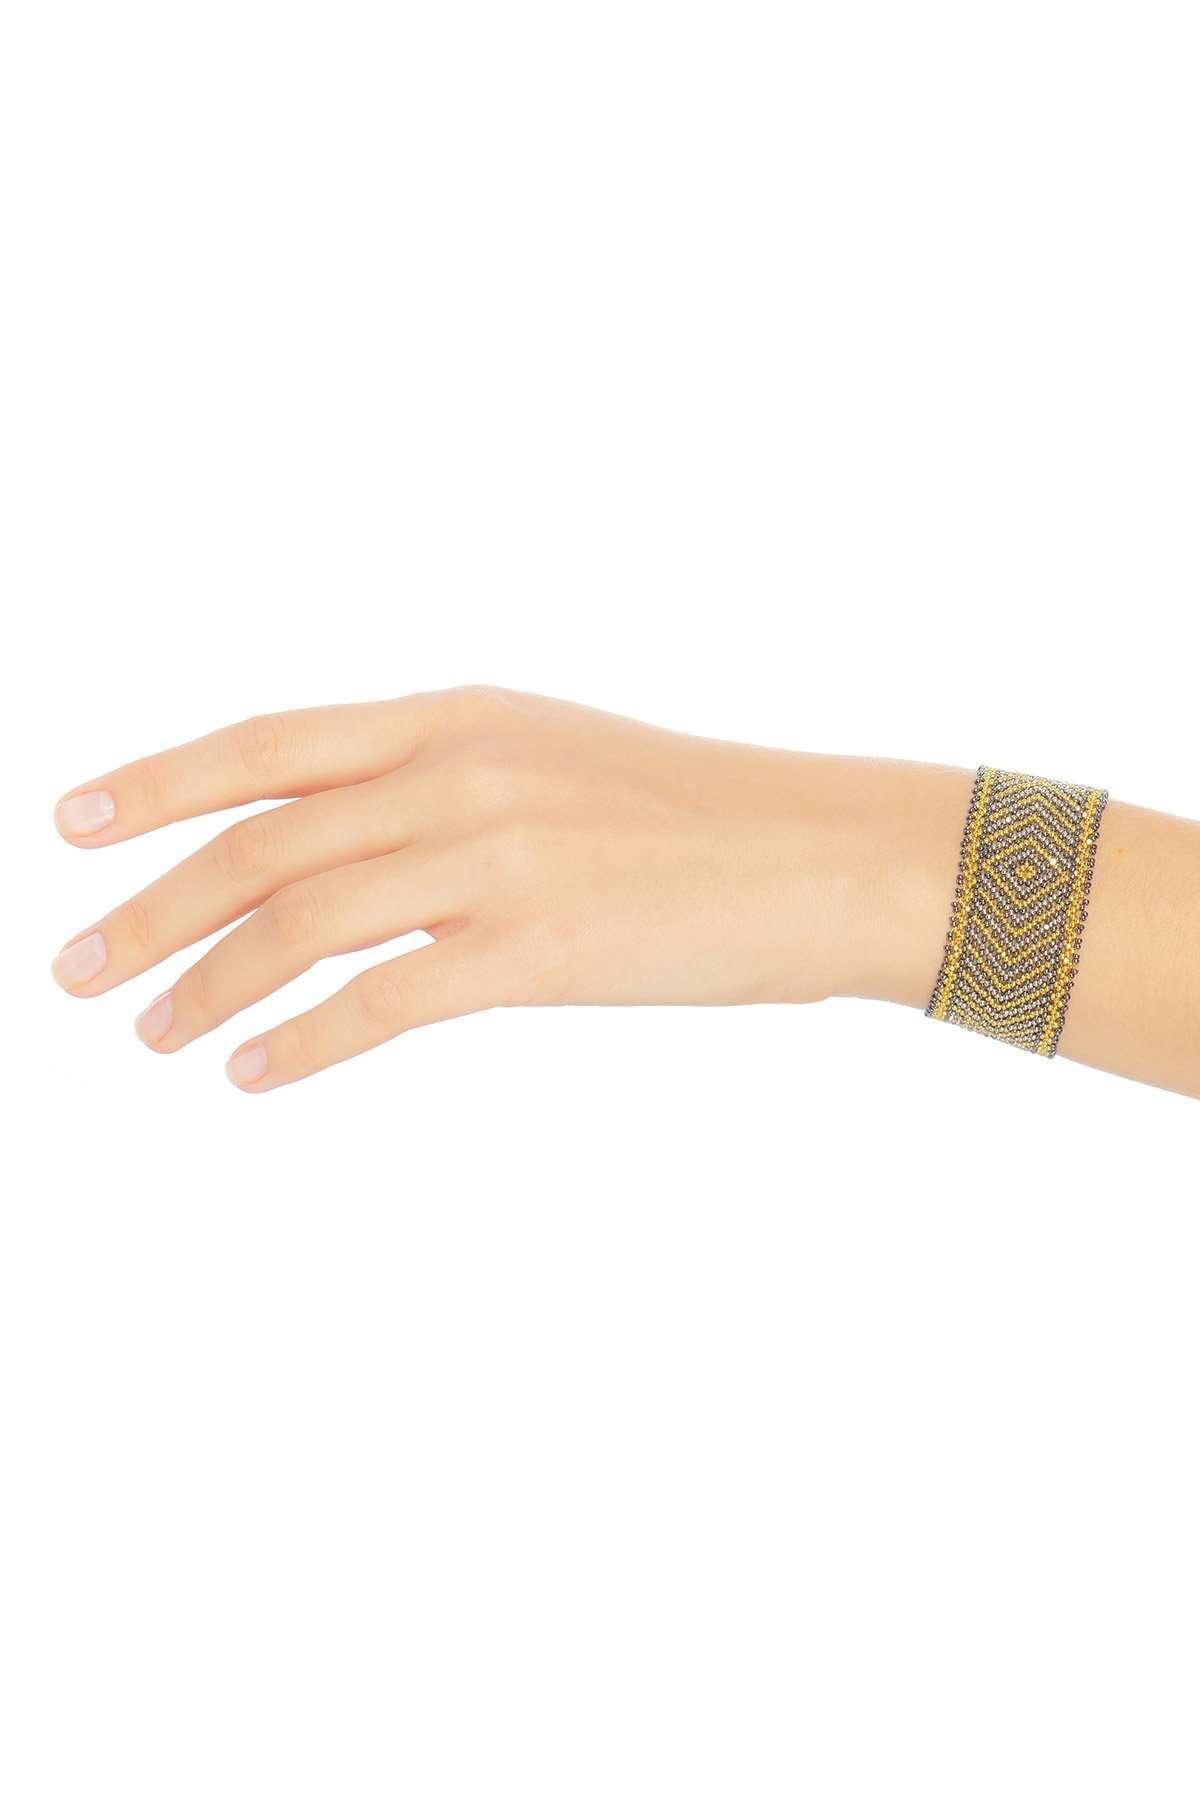 007-brazaletes-mediano-oro-platino-gris-alt1